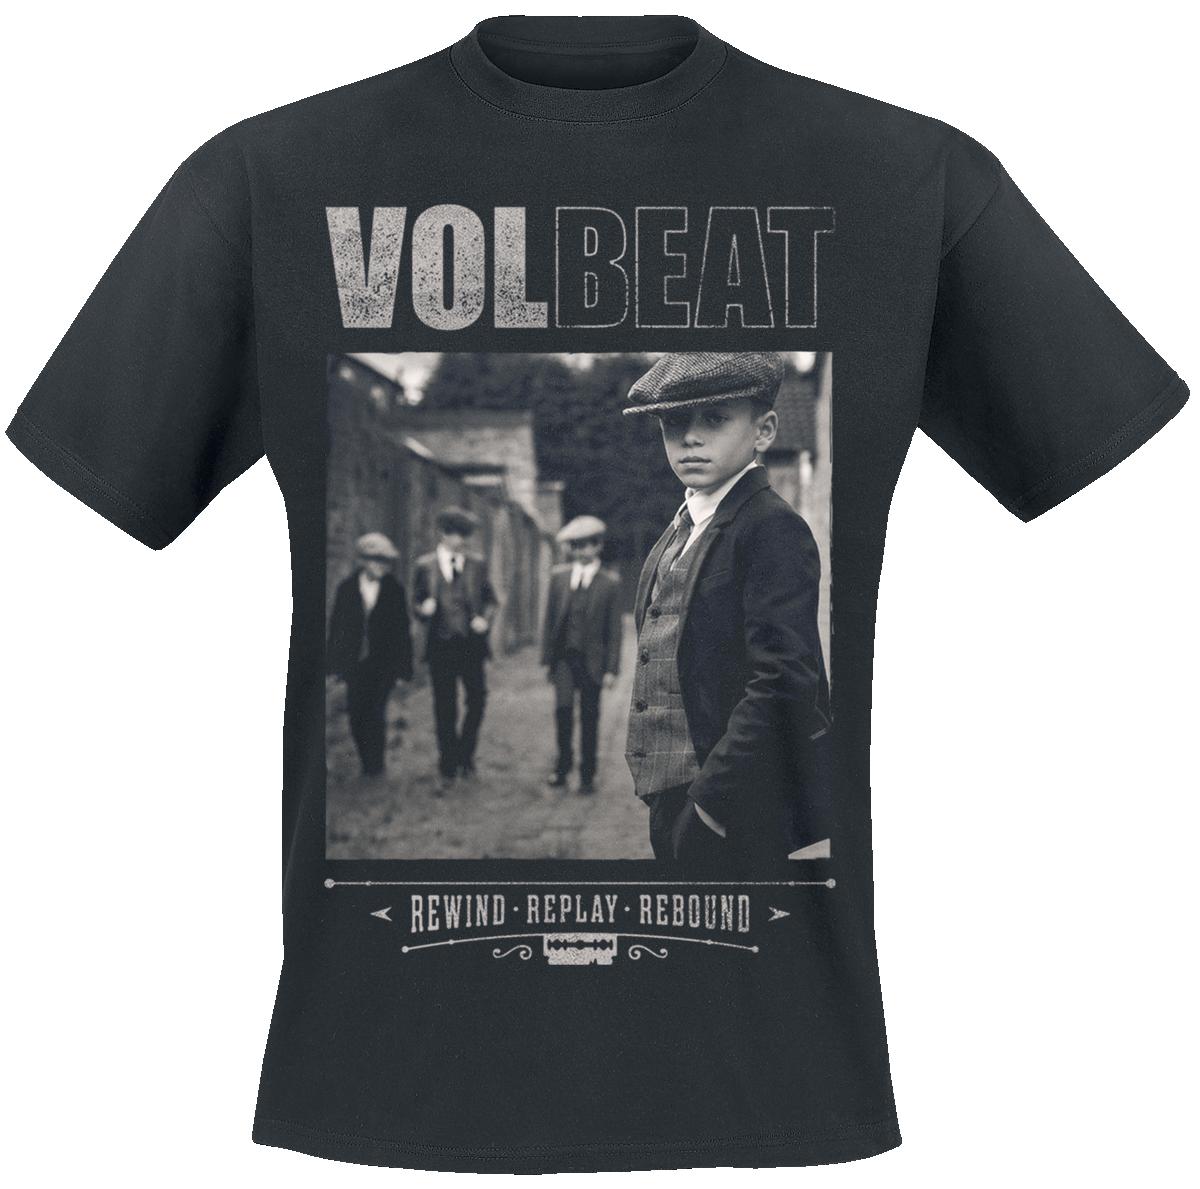 Volbeat - Cover - Rewind, Replay, Rebound - T-Shirt - black image